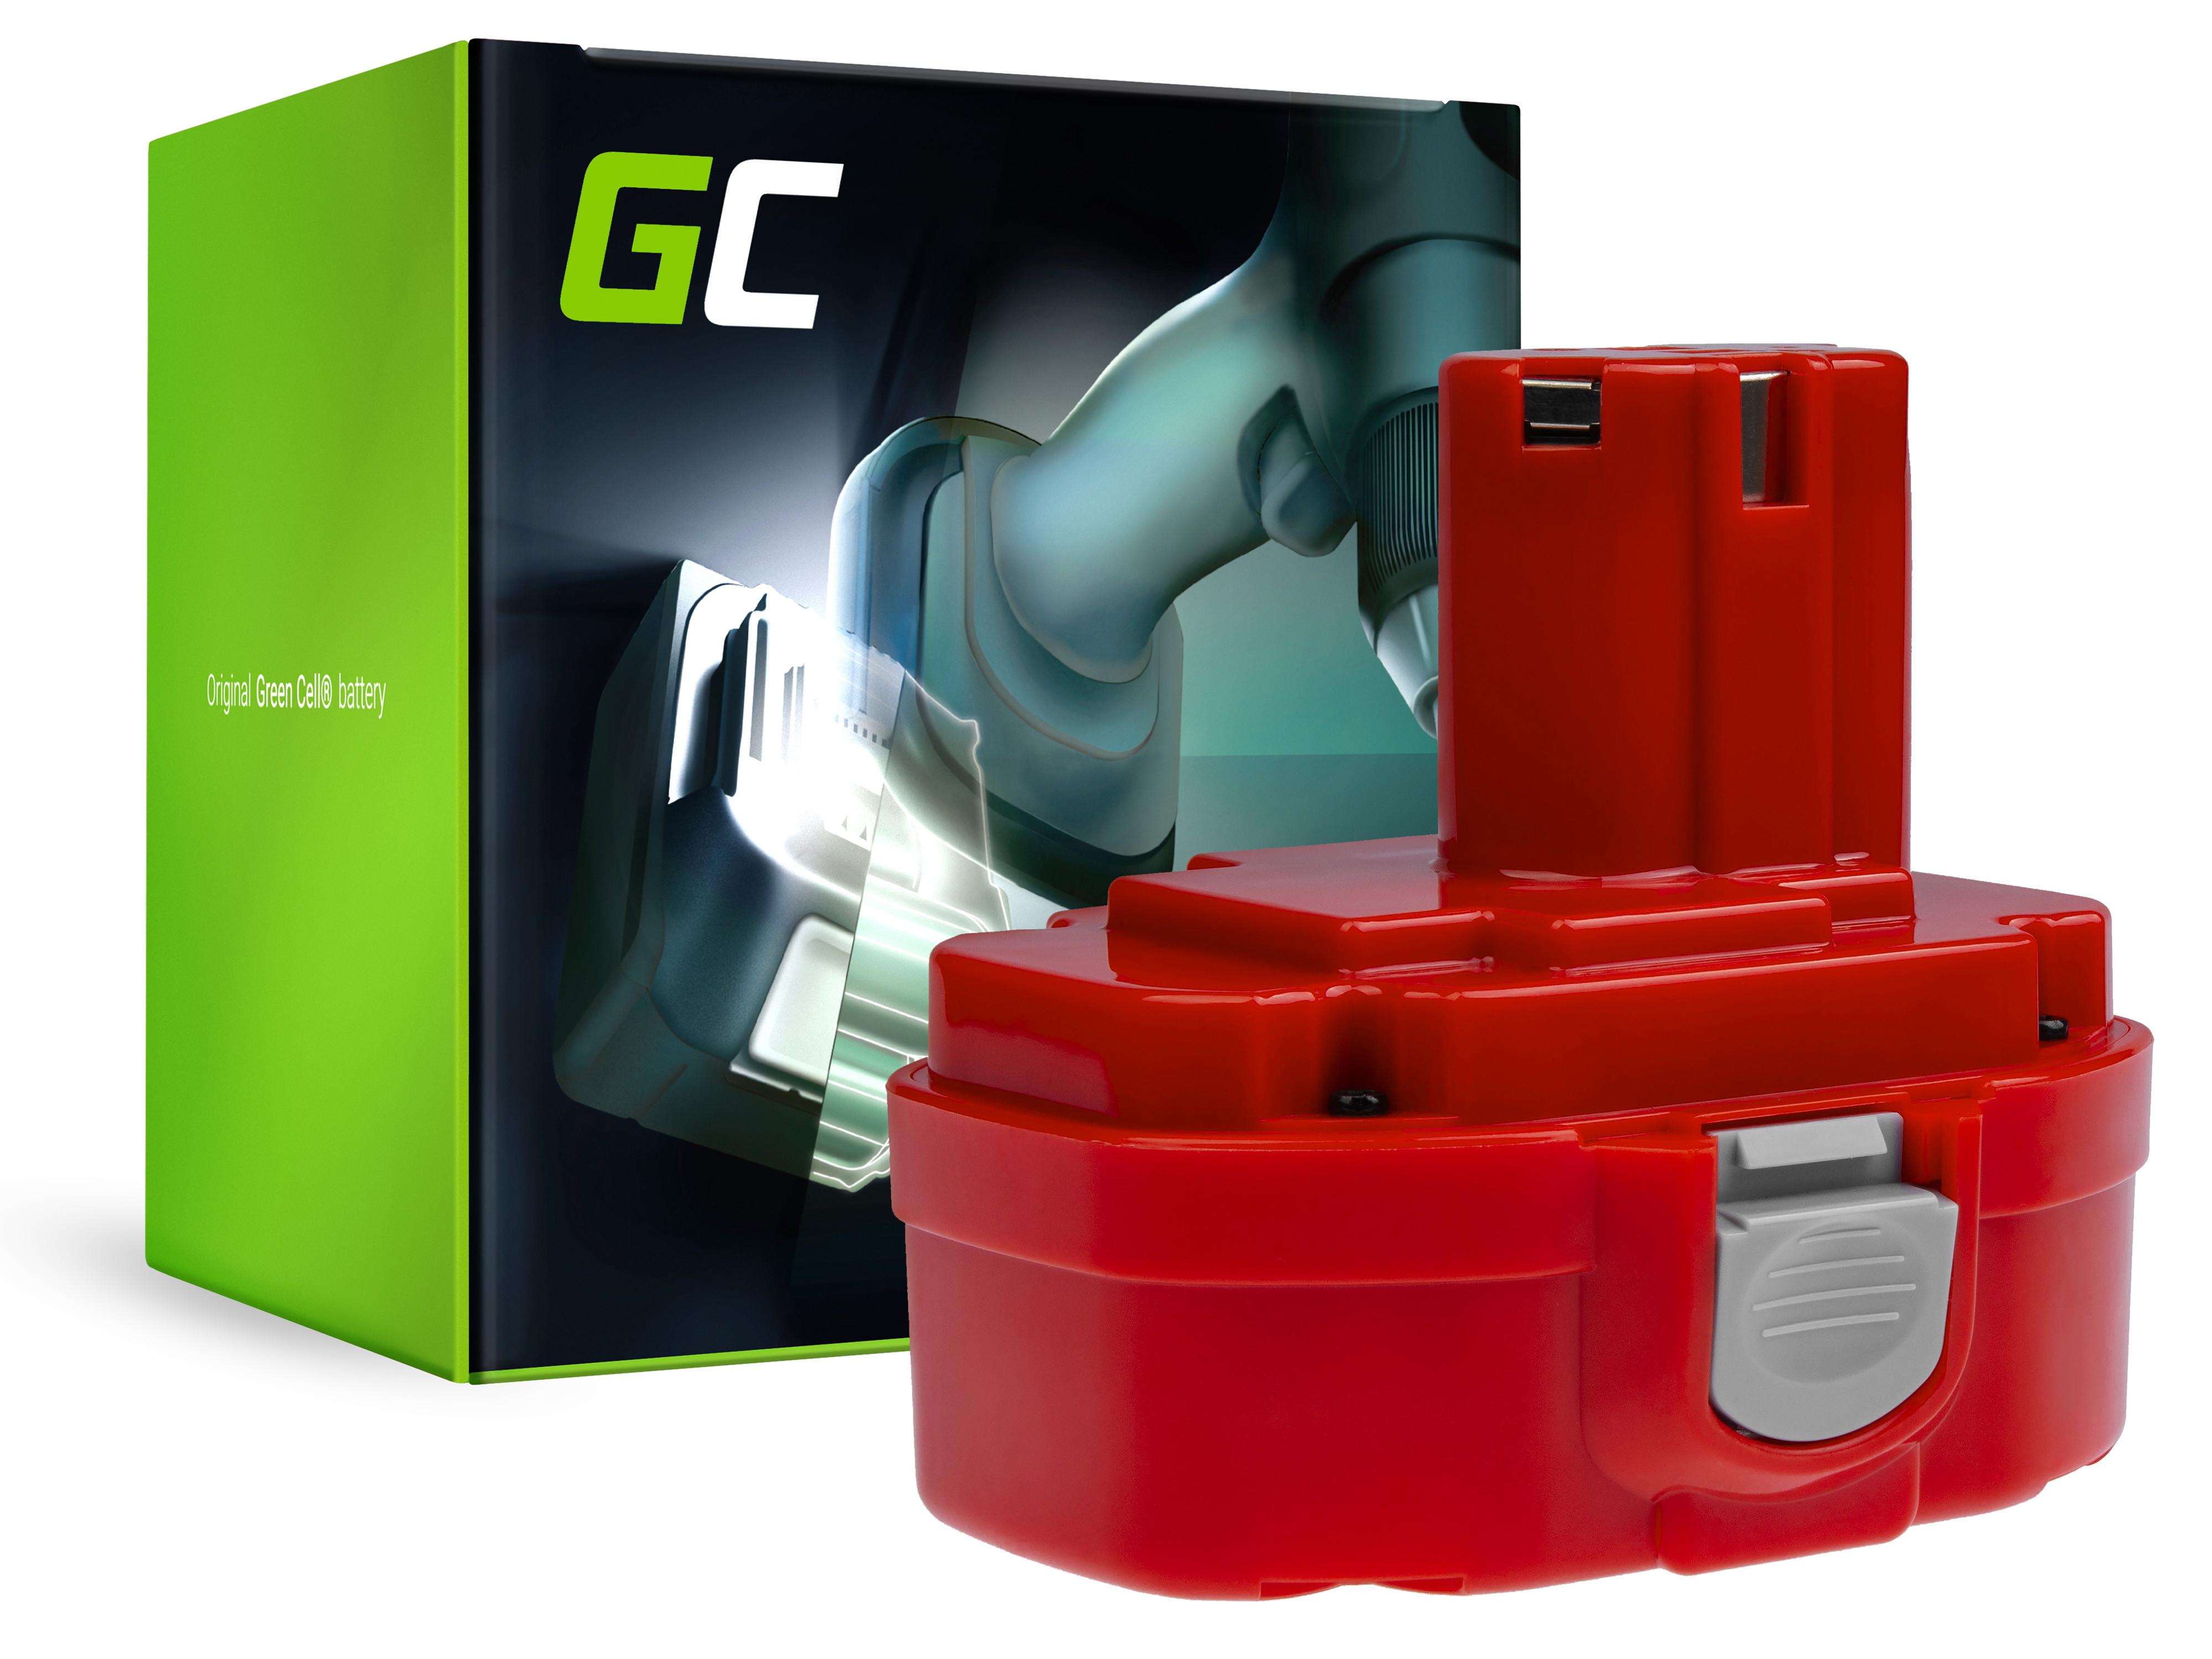 Baterie Green Cell Makita 1822 1833 PA18 Makita 4334D 6343D 6347D 6349D 6390D 8390D 8391D 18V 1500mAh Ni-MH – neoriginální